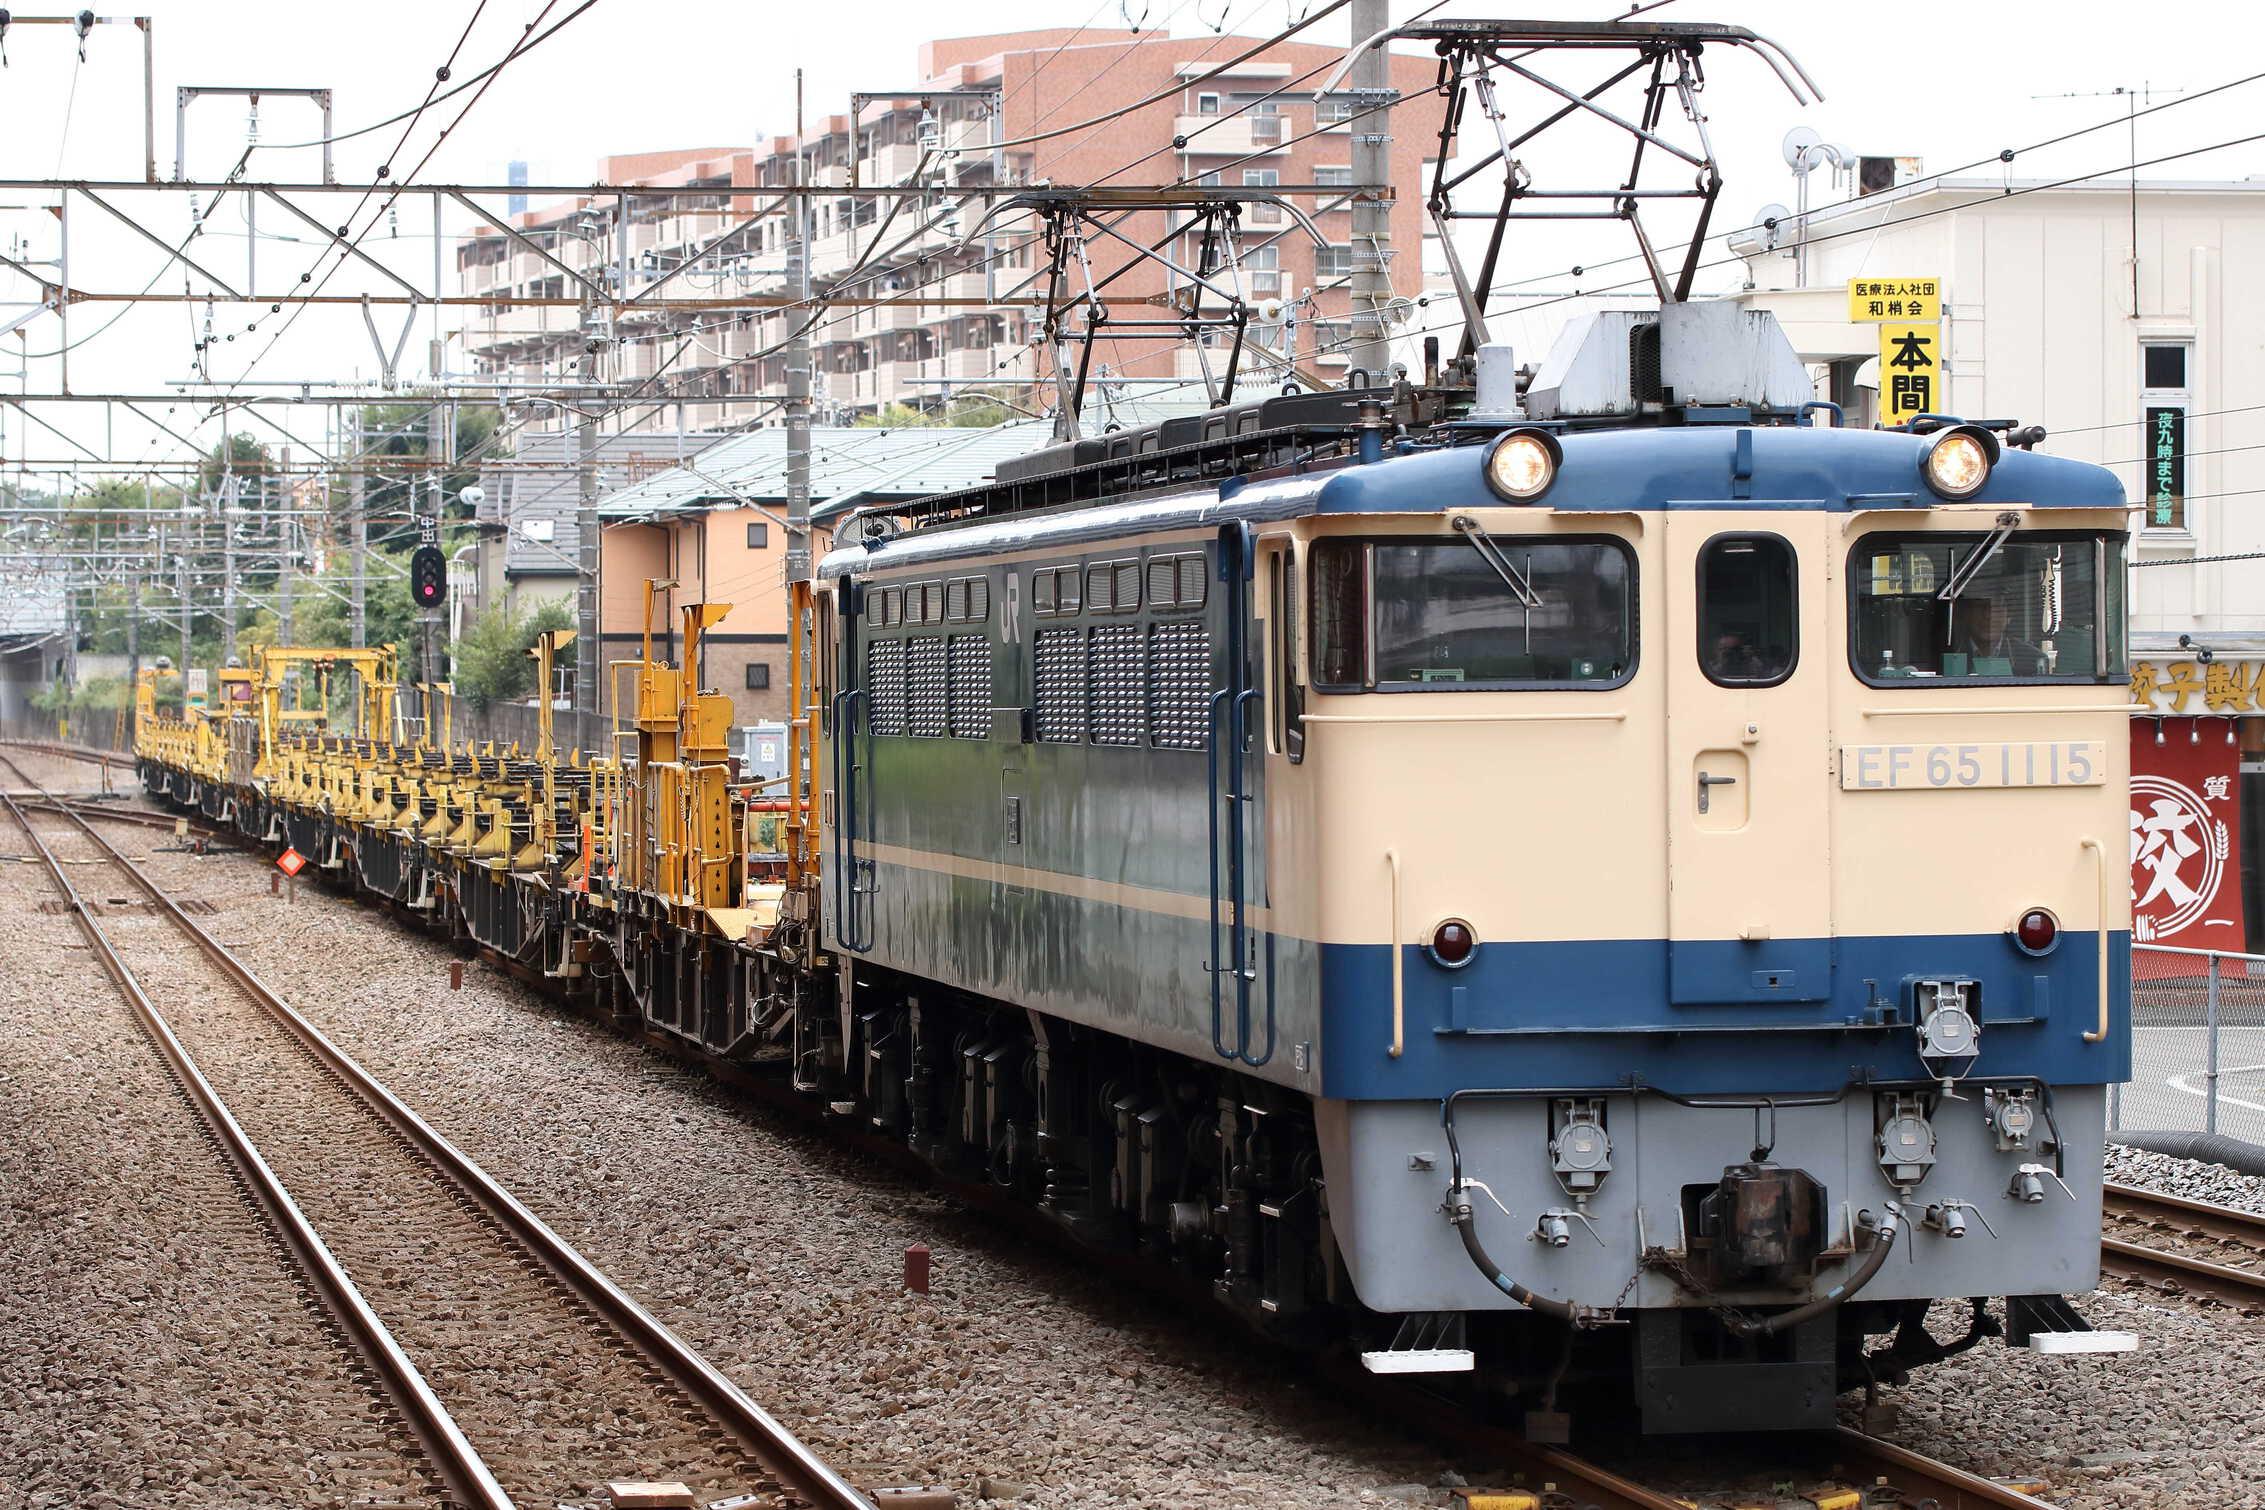 工9864列車 小田原工臨返空(浜北=14) EF65-1115①[田]+ロンチキC編成10車